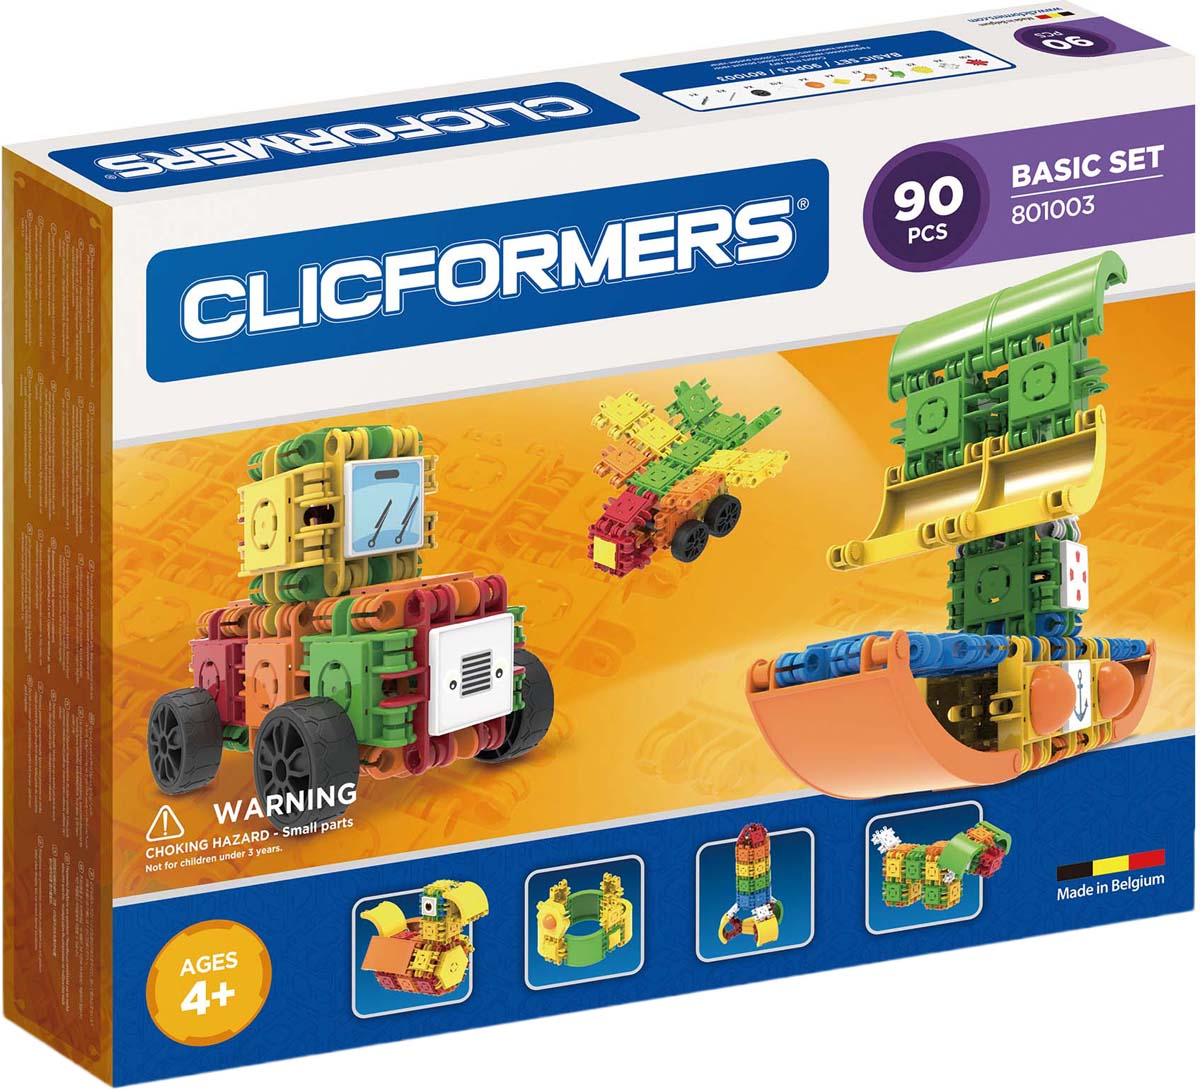 Clicformers Конструктор Basic Set 90 деталей clicformers конструктор clicformers transportation set mini 30 деталей